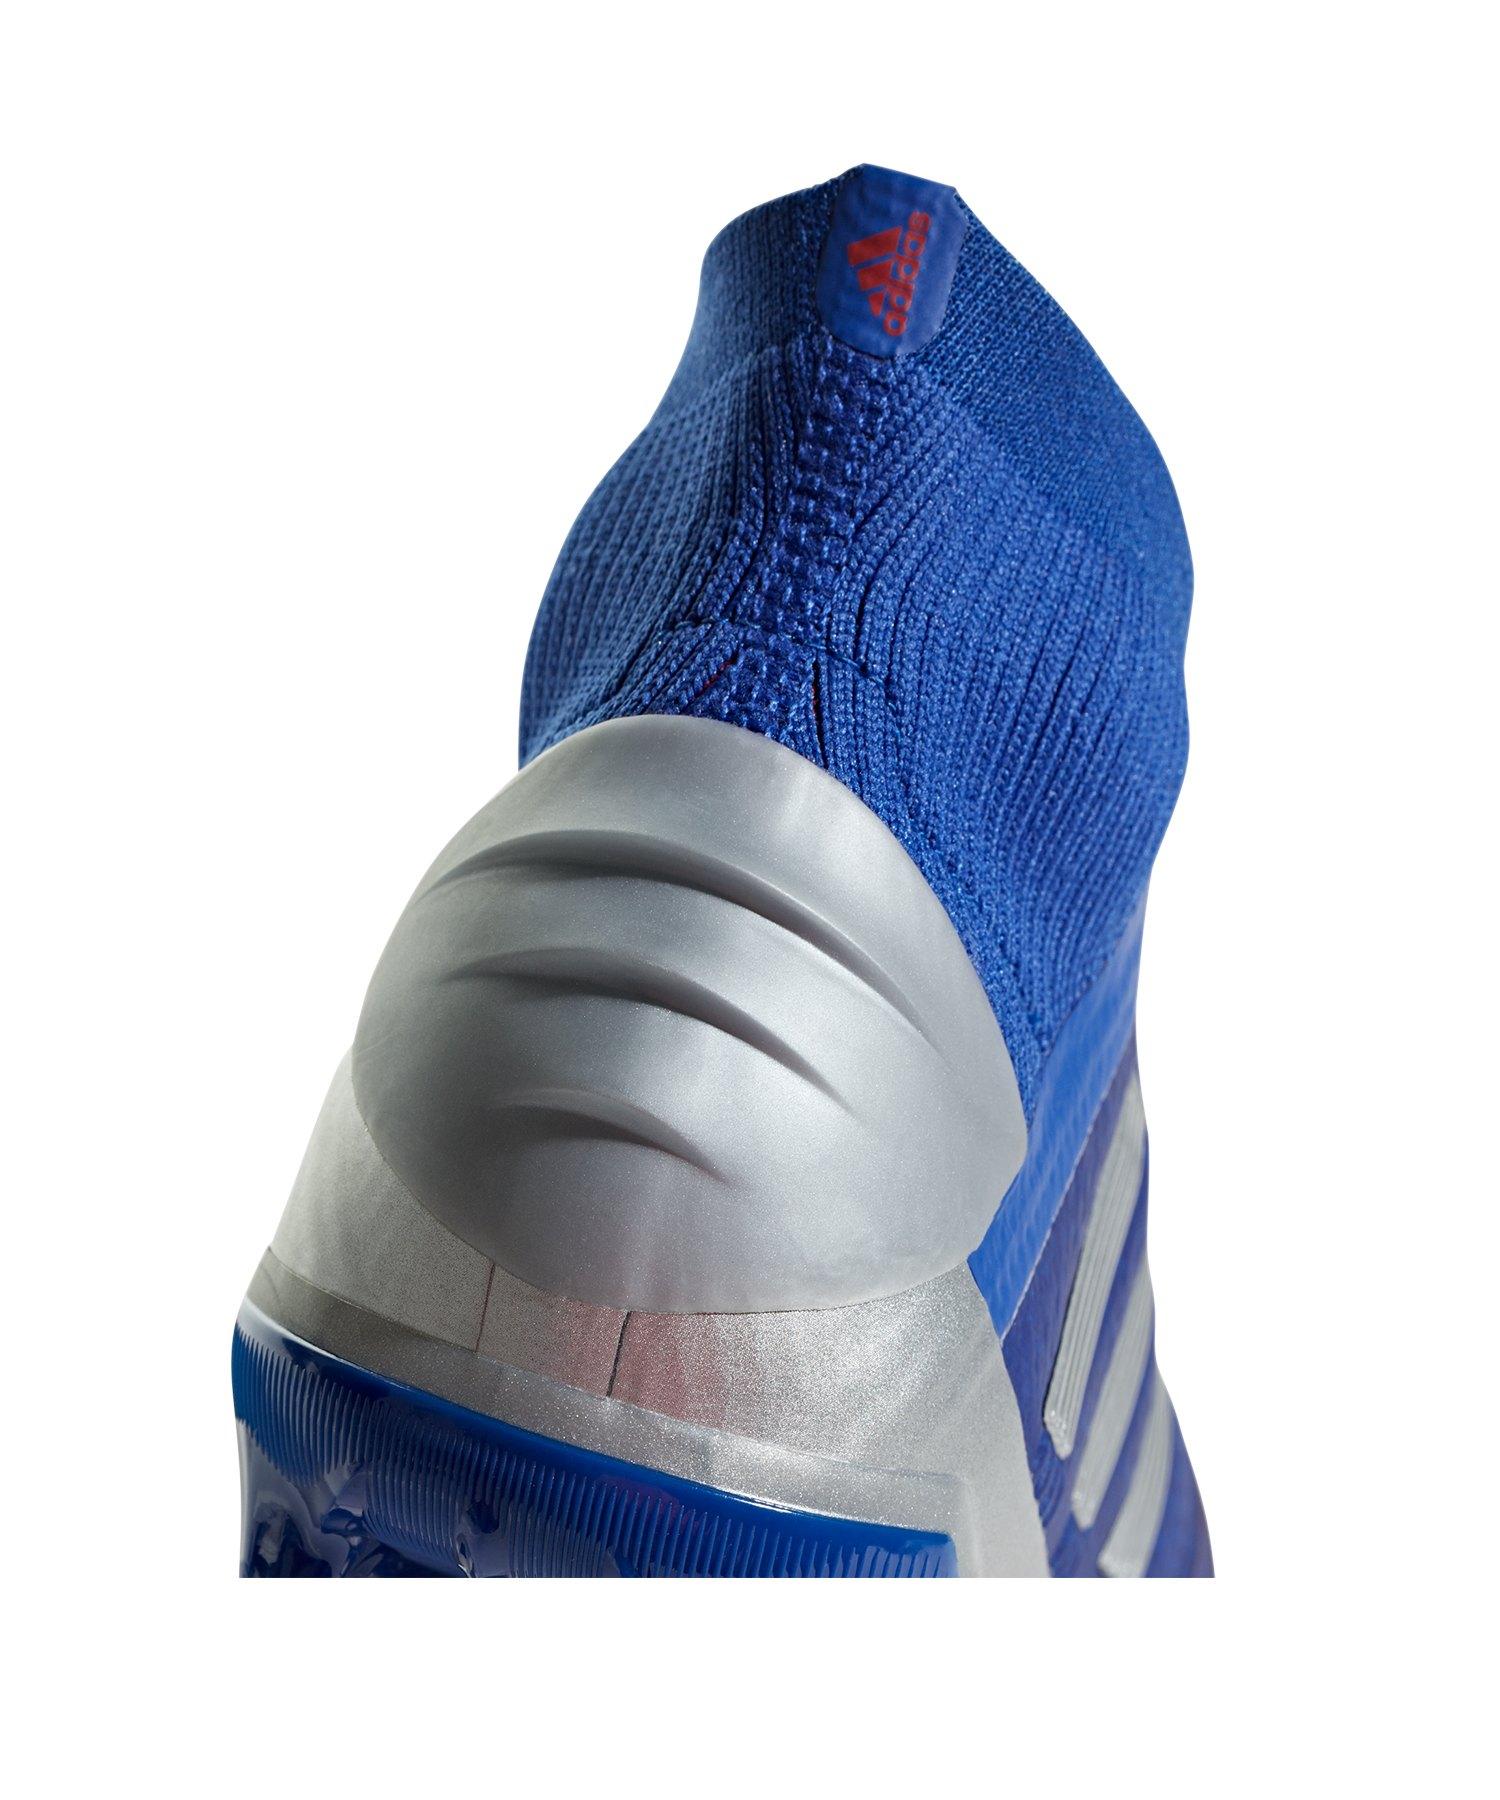 Silber 19Fg J Blau Predator Kids Adidas bYf7y6vg